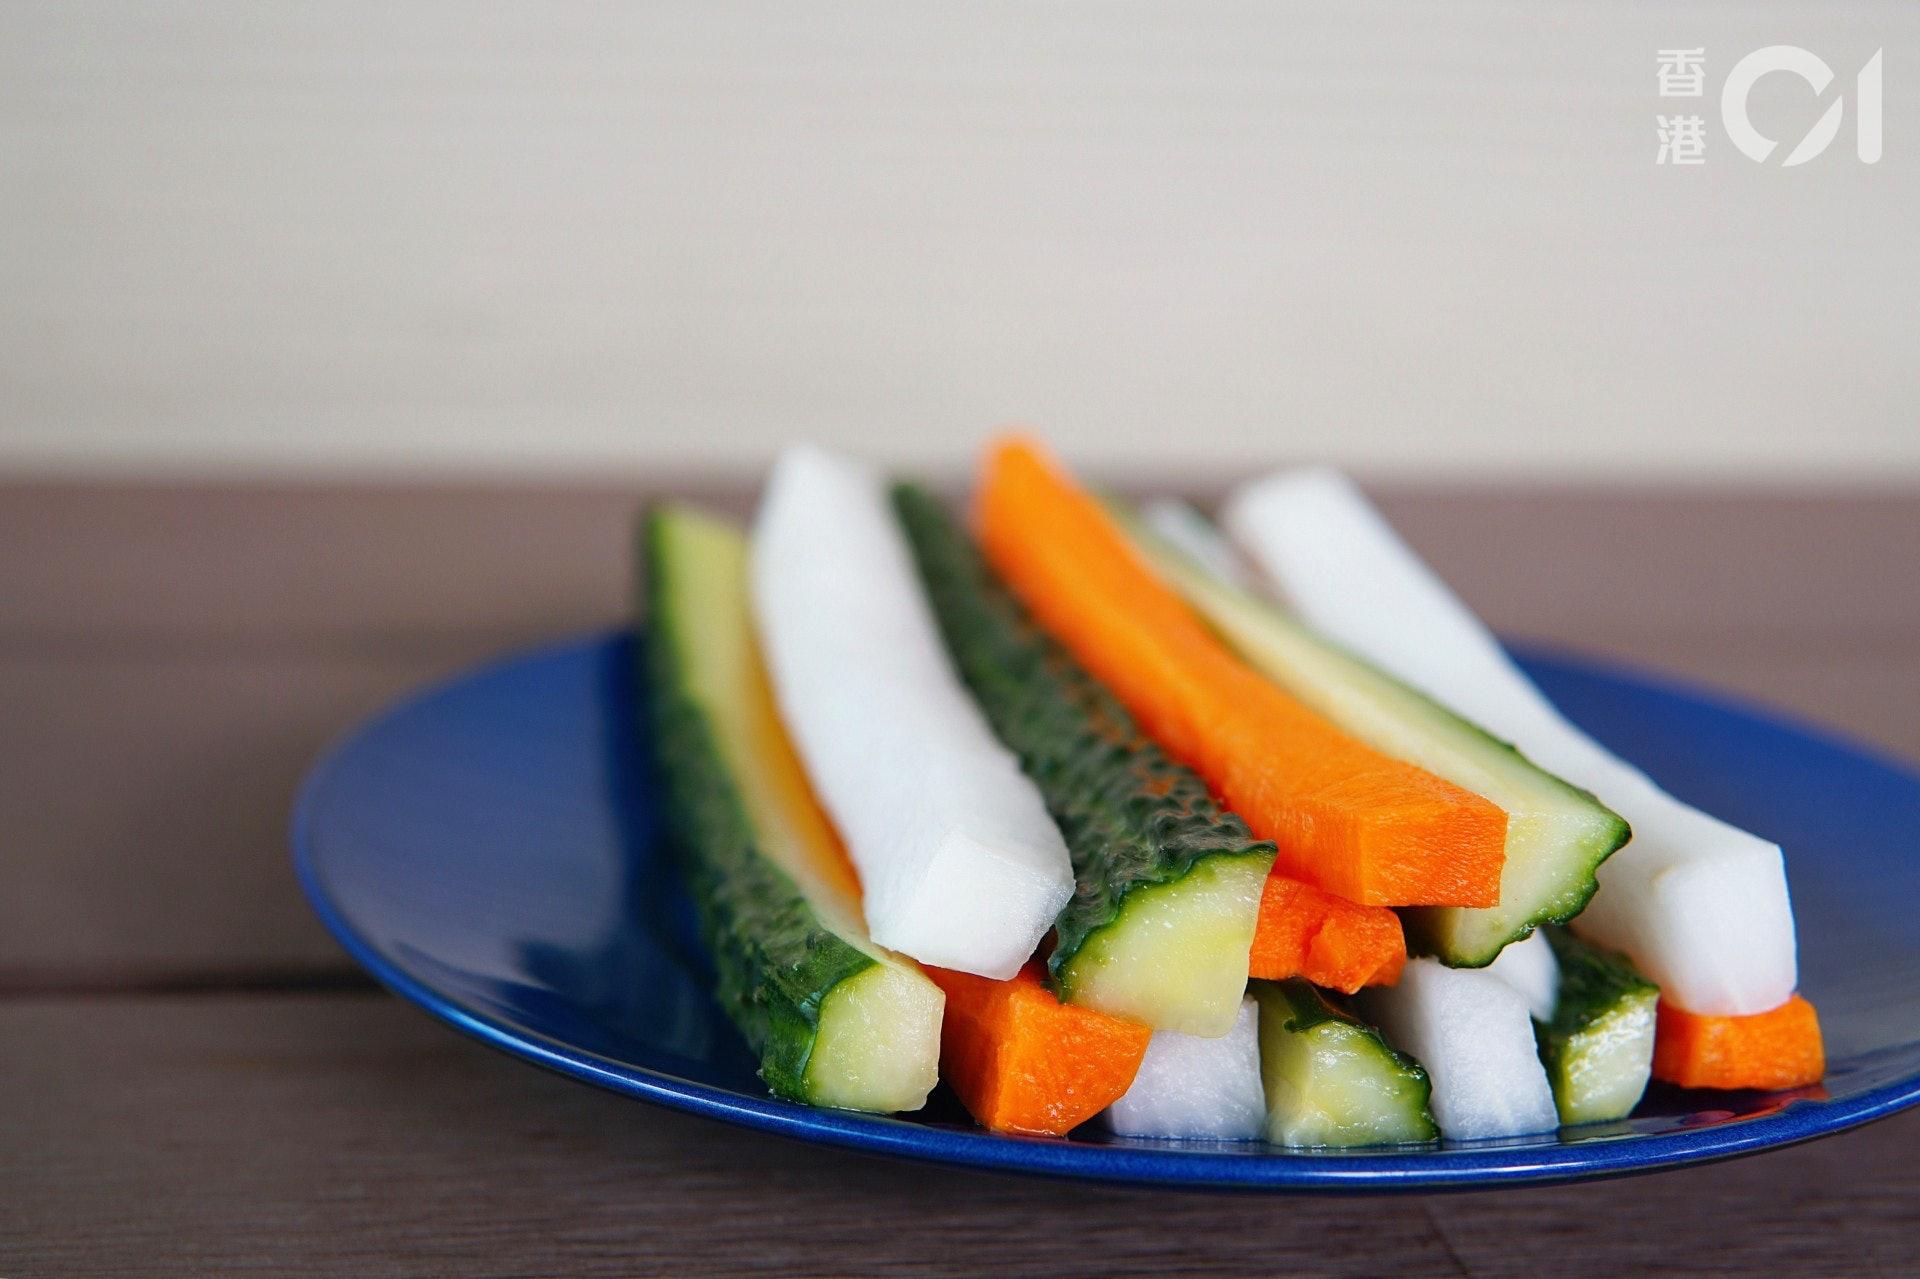 Lillian坦言大部分蔬菜都含有豐富膳食纖維,有助預防便秘。而不同種類的蔬菜都含有各自的營養素,如紅蘿蔔有豐富胡蘿蔔素,胡蘿蔔素可在身體中轉化成維他命A,有助維持眼睛健康;紅菜頭含有抗氧化物甜菜紅素,有助抵抗自由基對細胞的破壞,防止血管硬化。